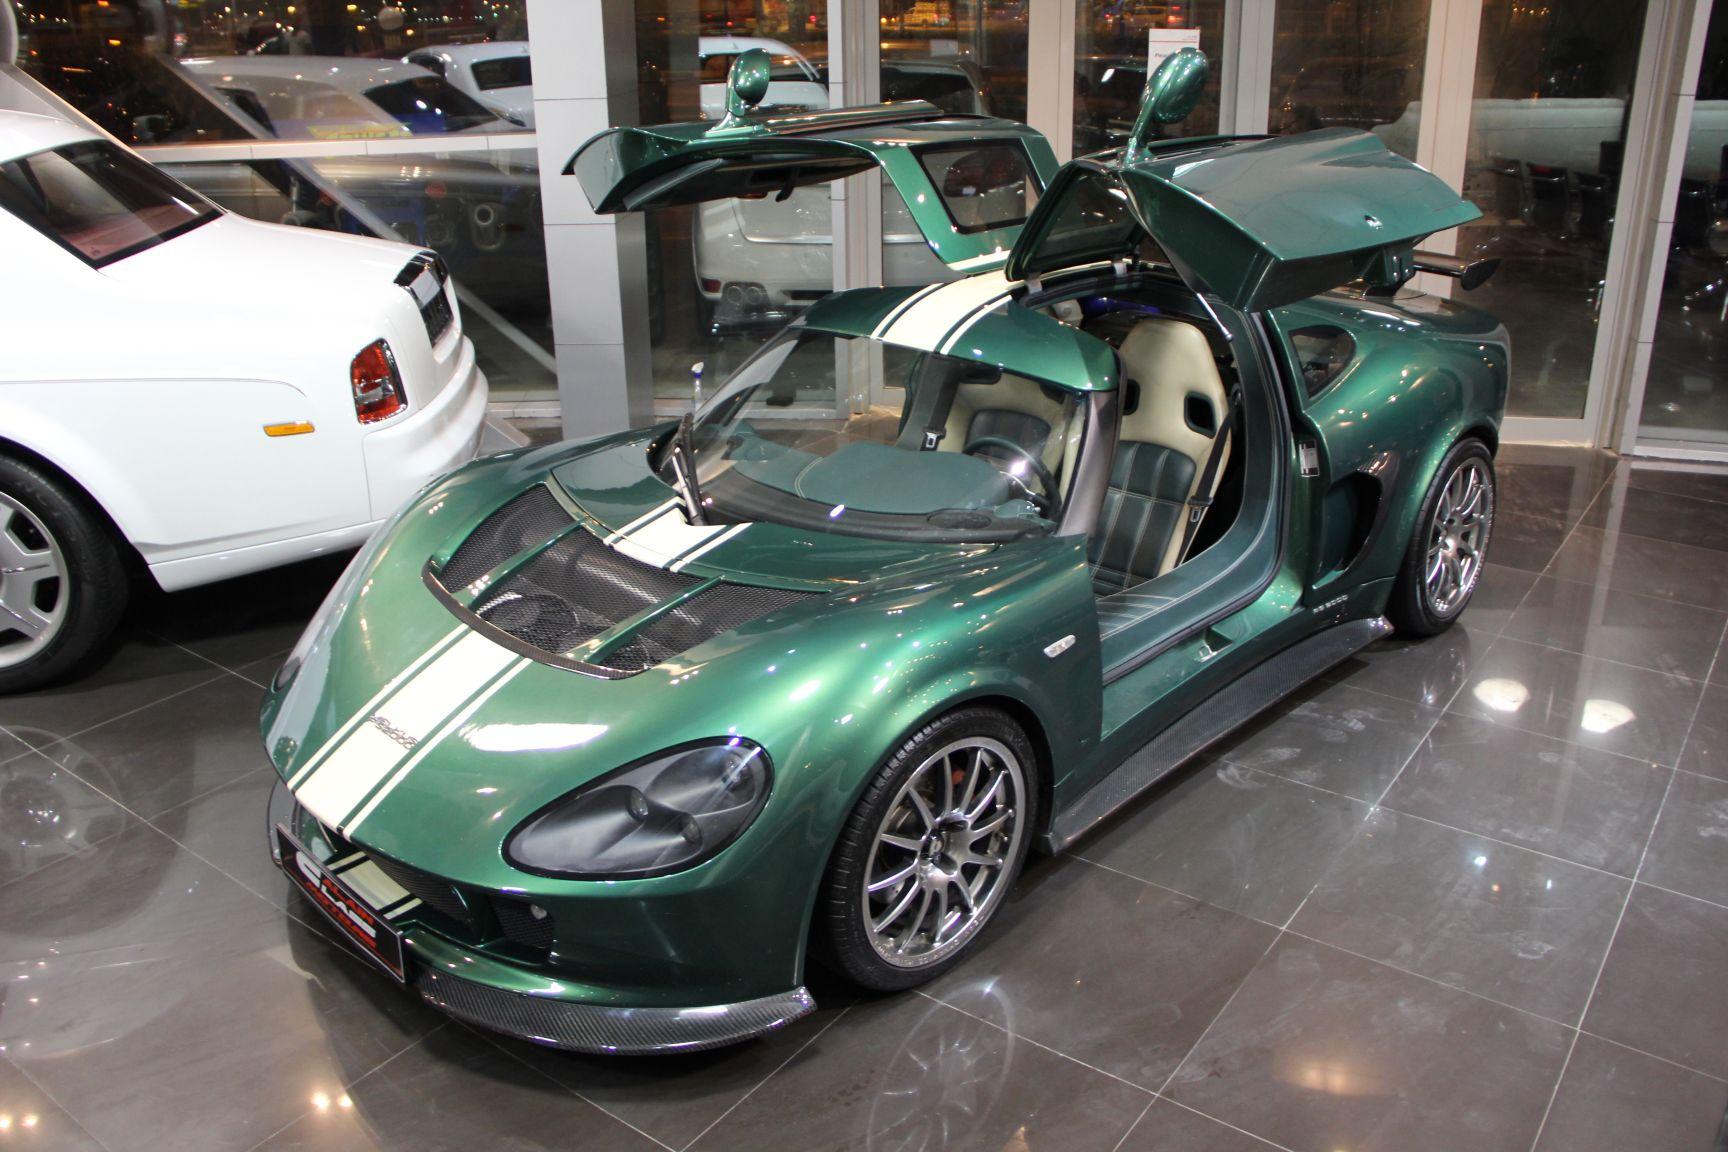 MELKUS RS 2000 GTS